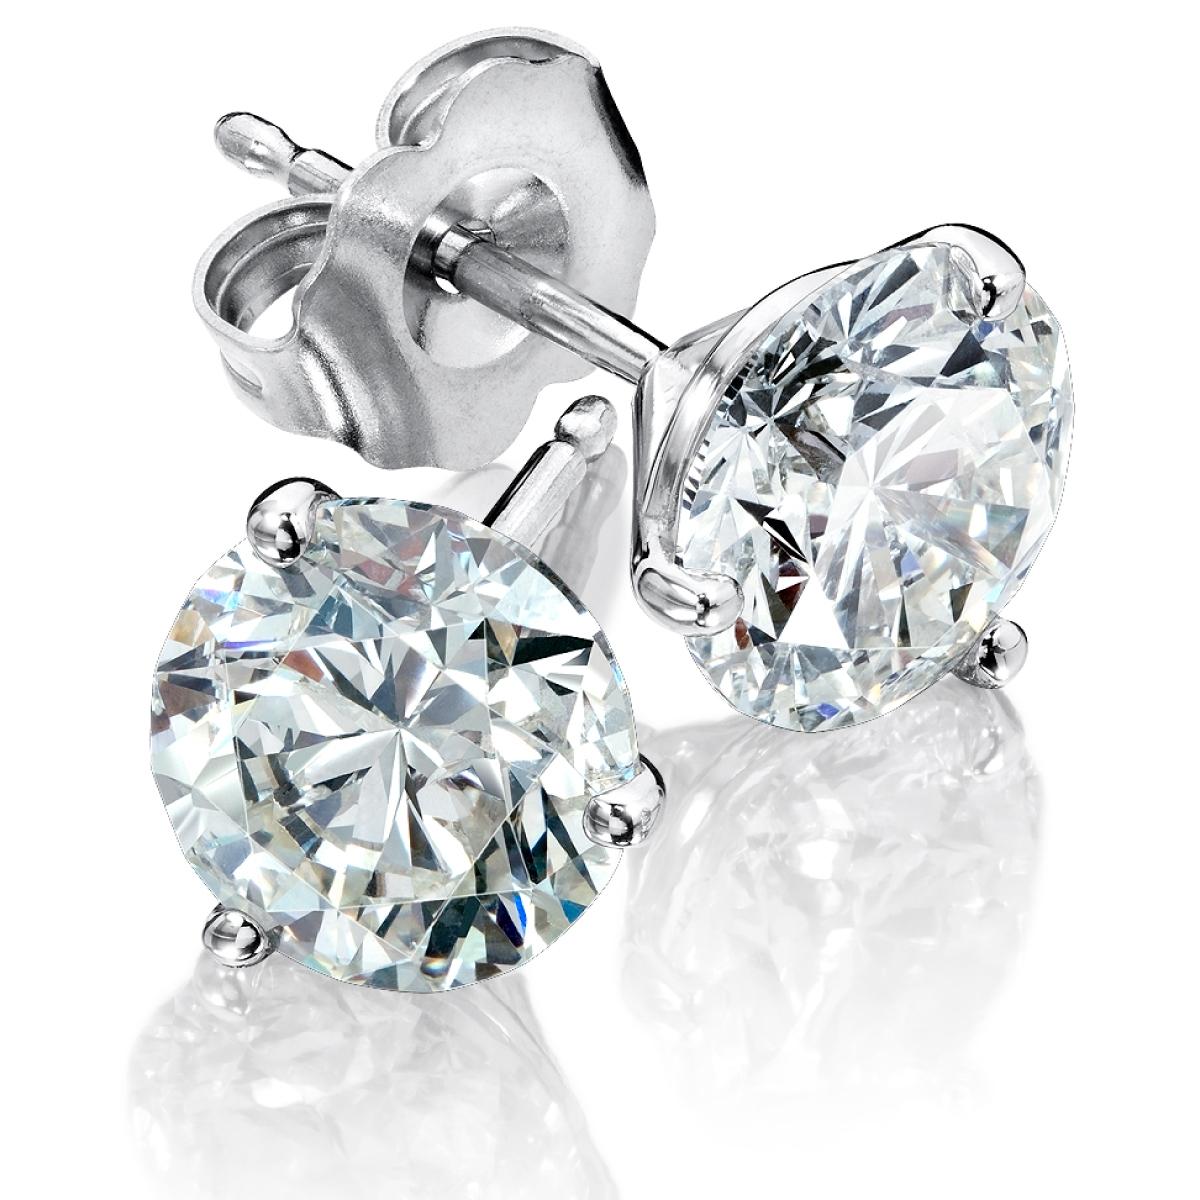 Diamond Stud and Cluster Earrings